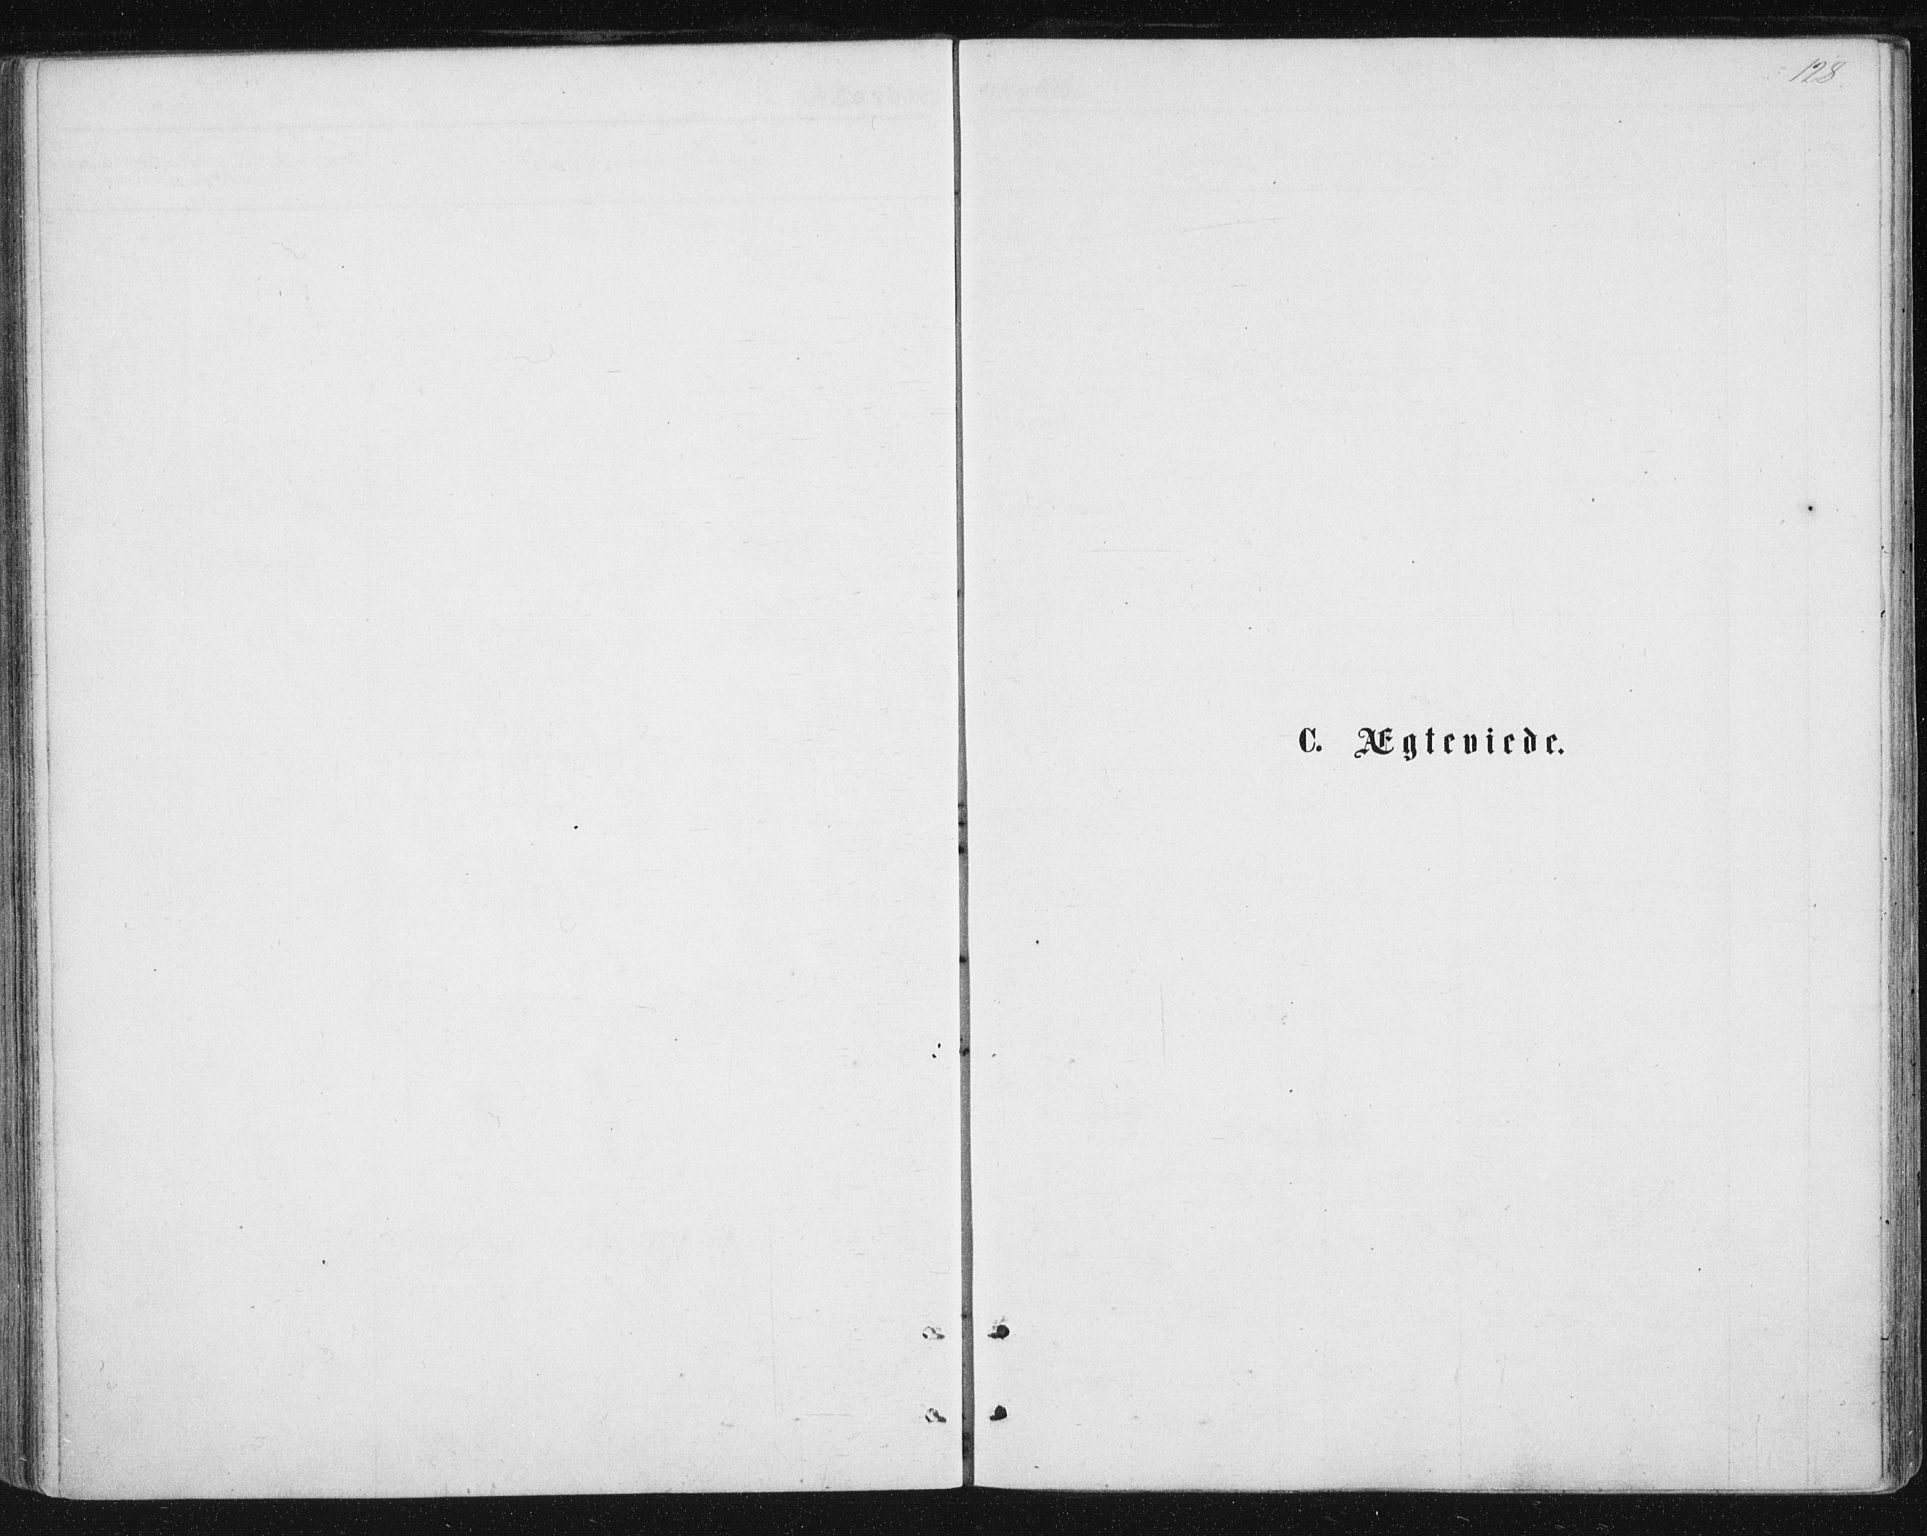 SAT, Ministerialprotokoller, klokkerbøker og fødselsregistre - Nordland, 888/L1243: Ministerialbok nr. 888A09, 1876-1879, s. 128